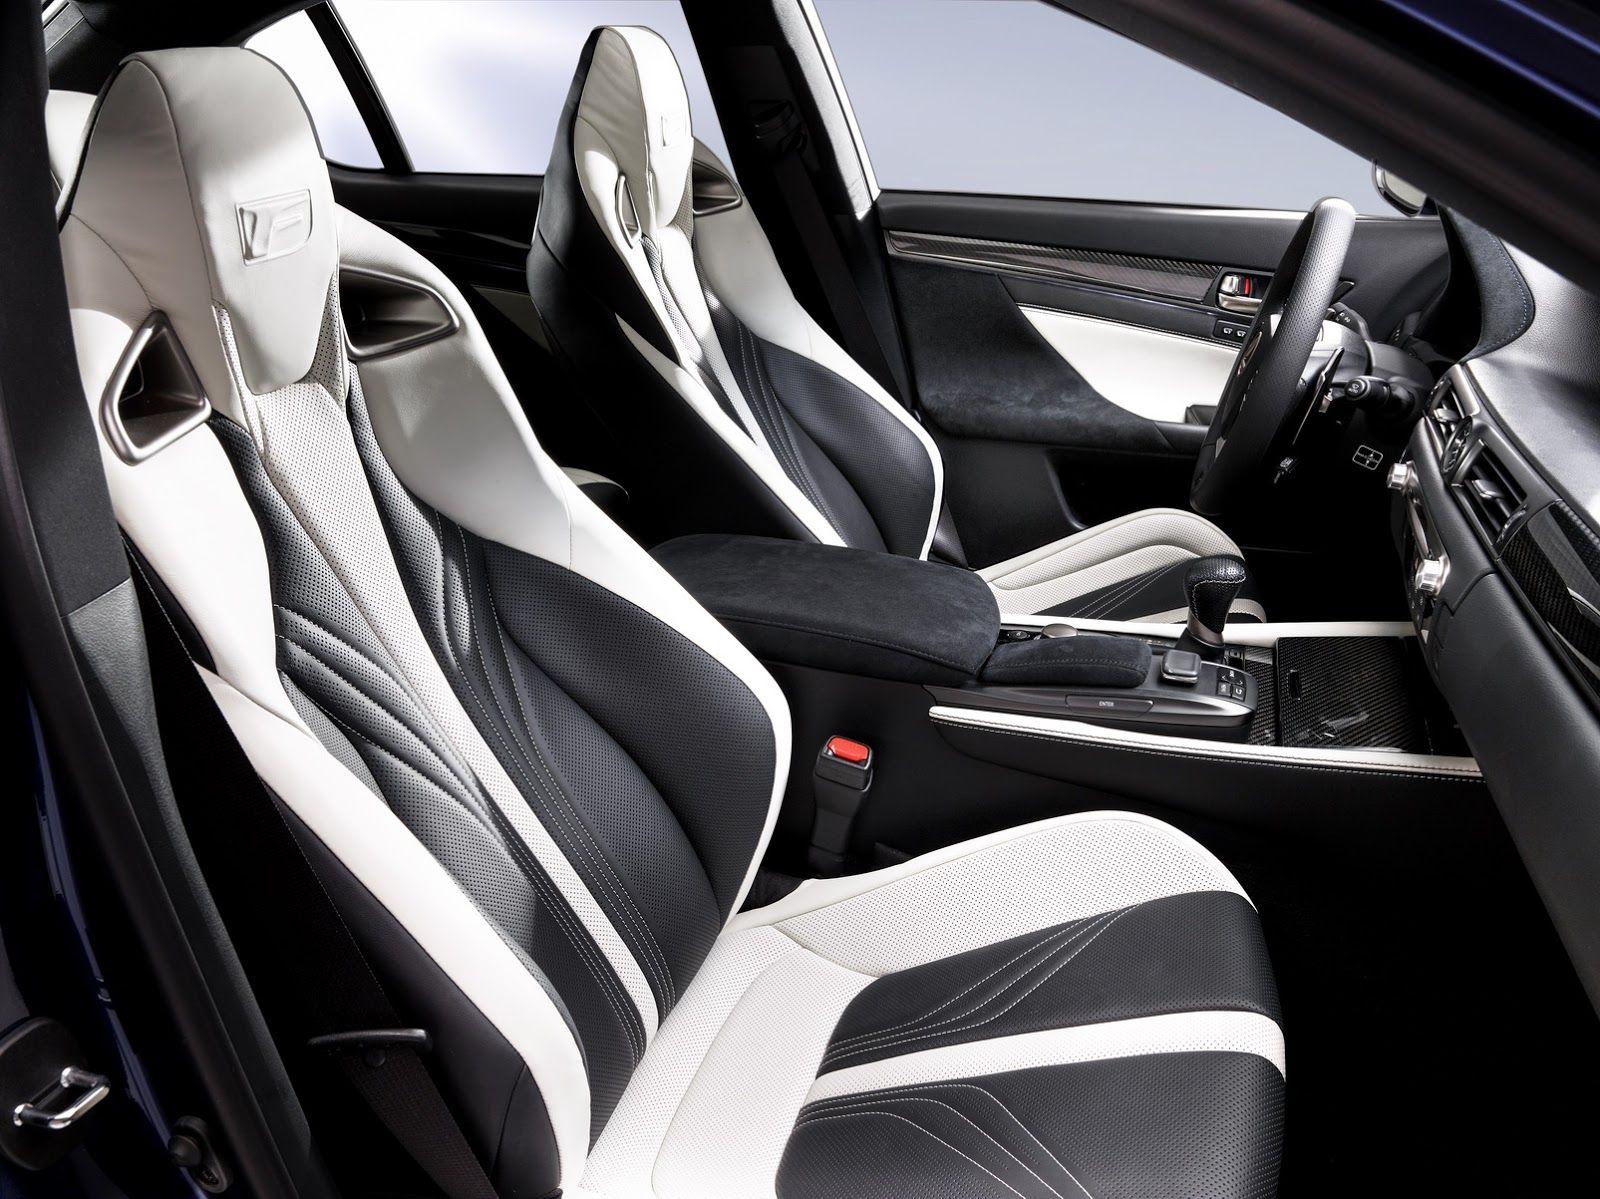 New 2016 Lexus Gs F 13 Clublexus Lexus Lexus Cars Car Seats